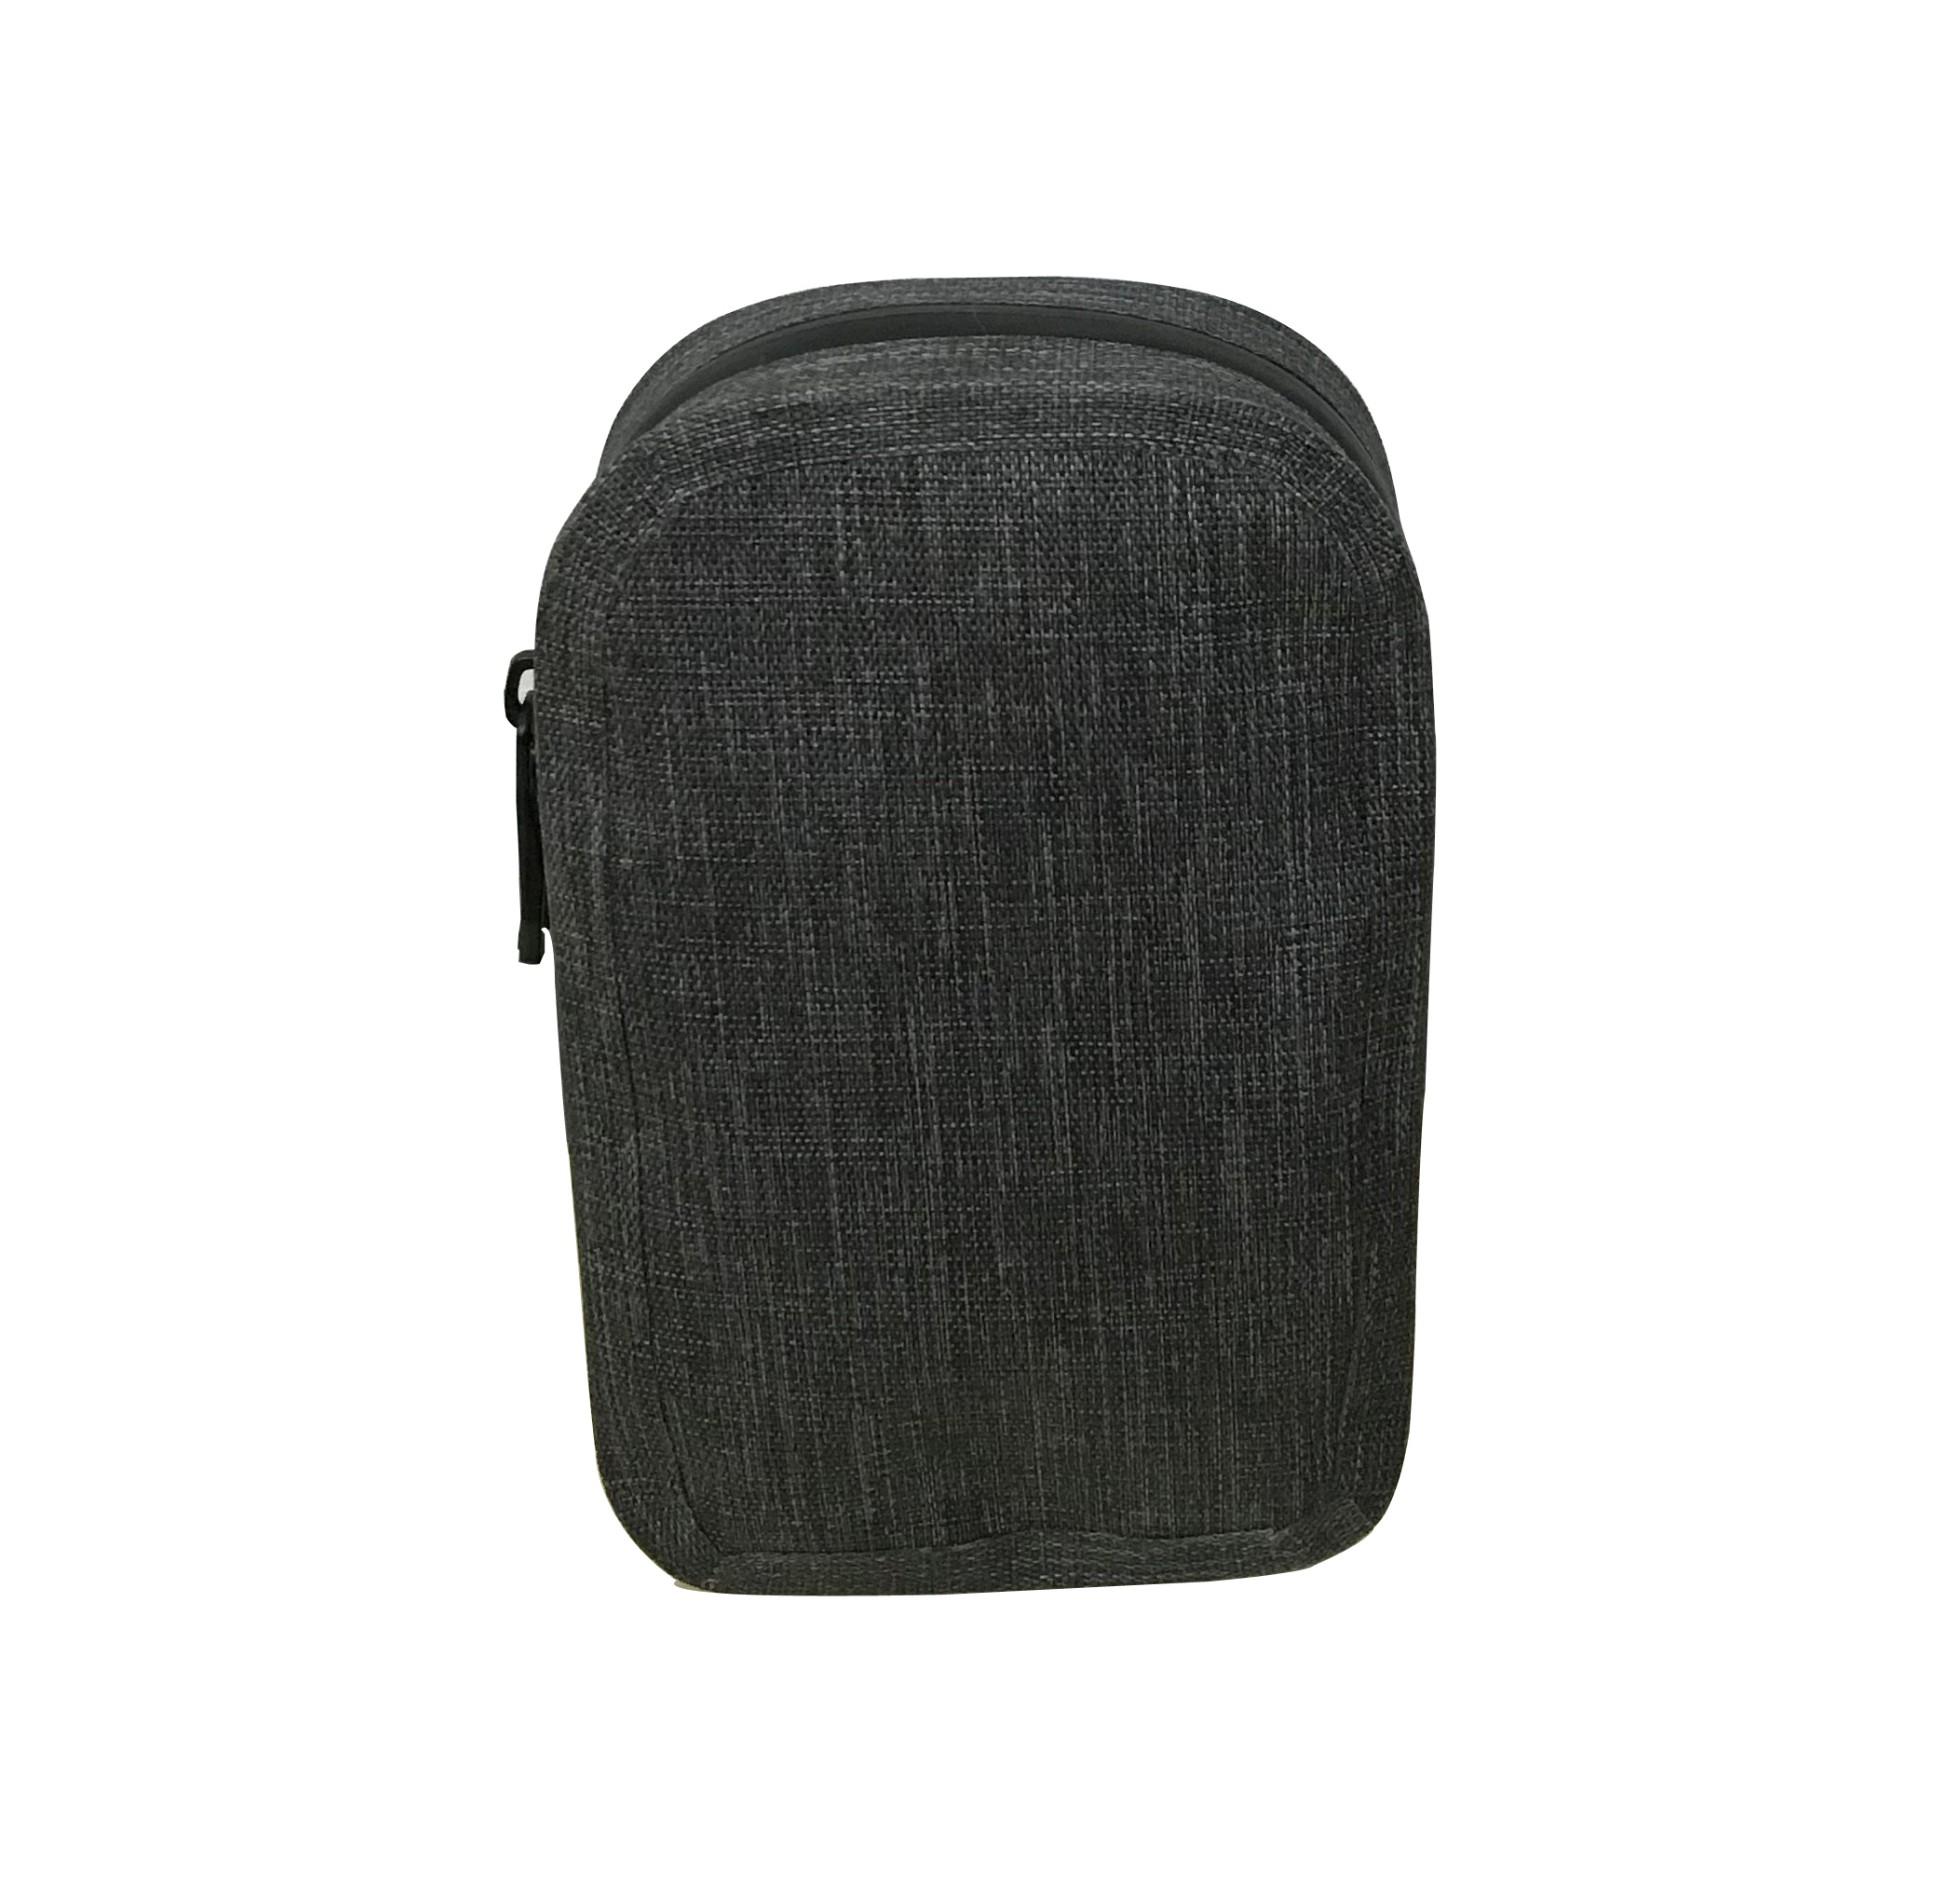 Waterproof Phone Case Dry Bag Manufacturers, Waterproof Phone Case Dry Bag Factory, Supply Waterproof Phone Case Dry Bag